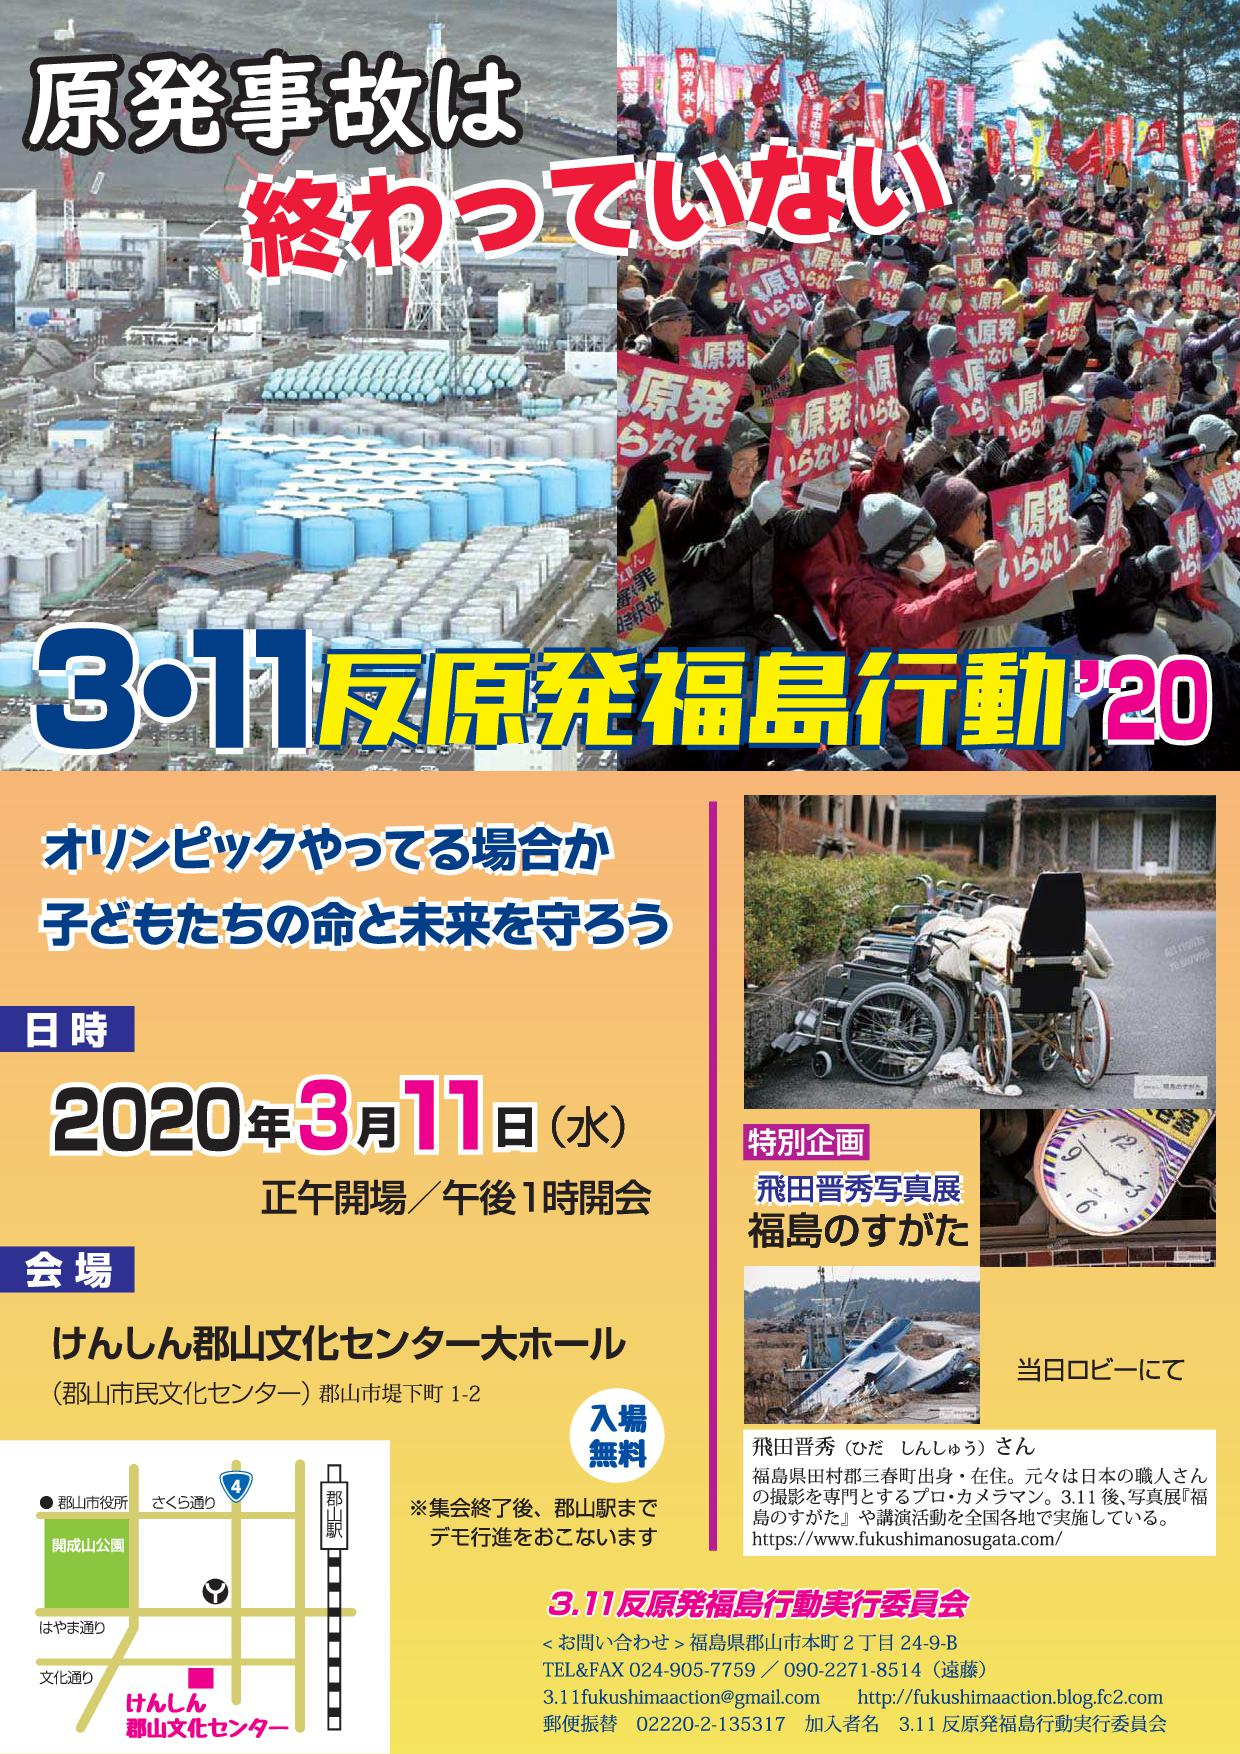 https://blog-imgs-132.fc2.com/f/u/k/fukushimaaction/2020311omote.jpg